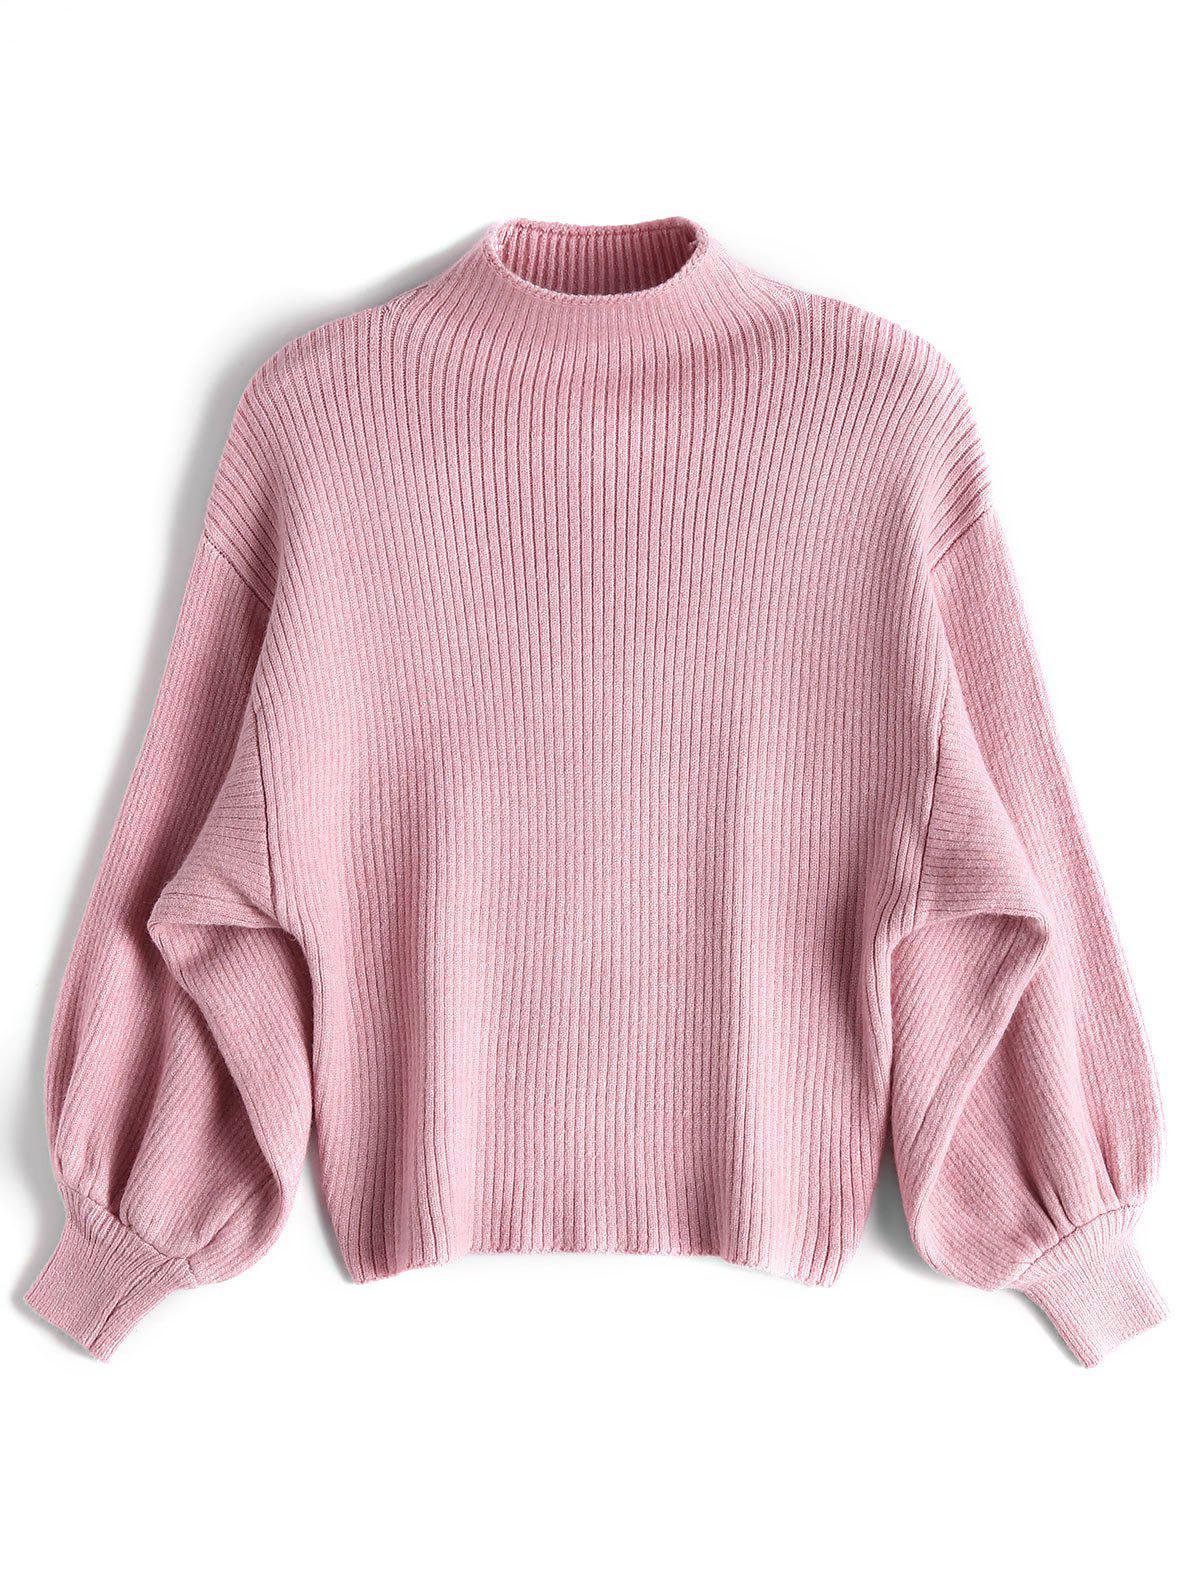 Lantern Sleeve Mock Neck Sweater